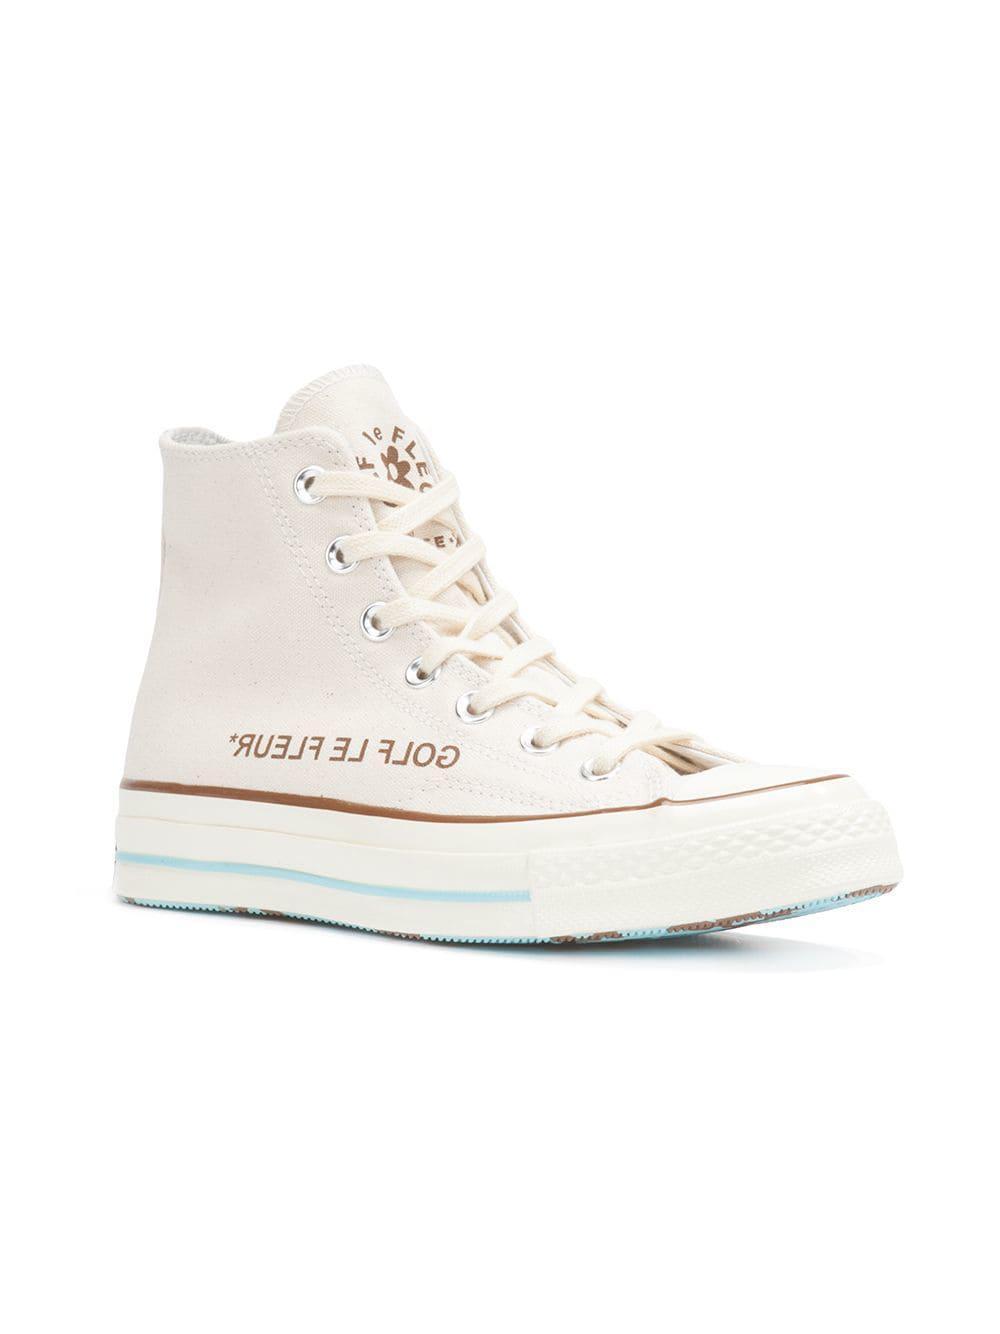 Lyst Converse Golf Le Fleur Chuck 70 High Top Sneakers In White